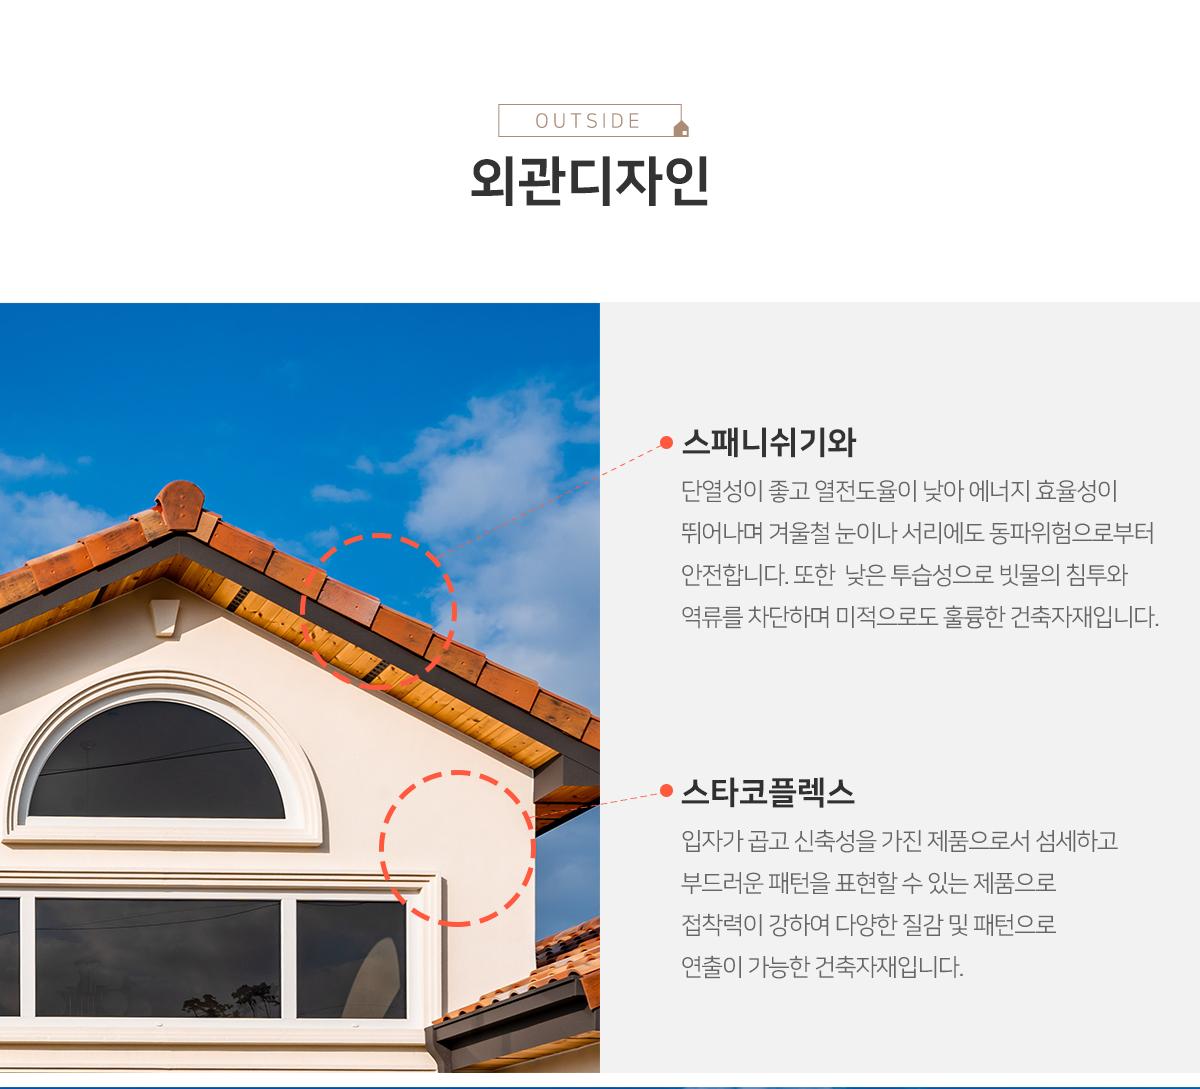 002_outside_군산_명신전기_01.jpg